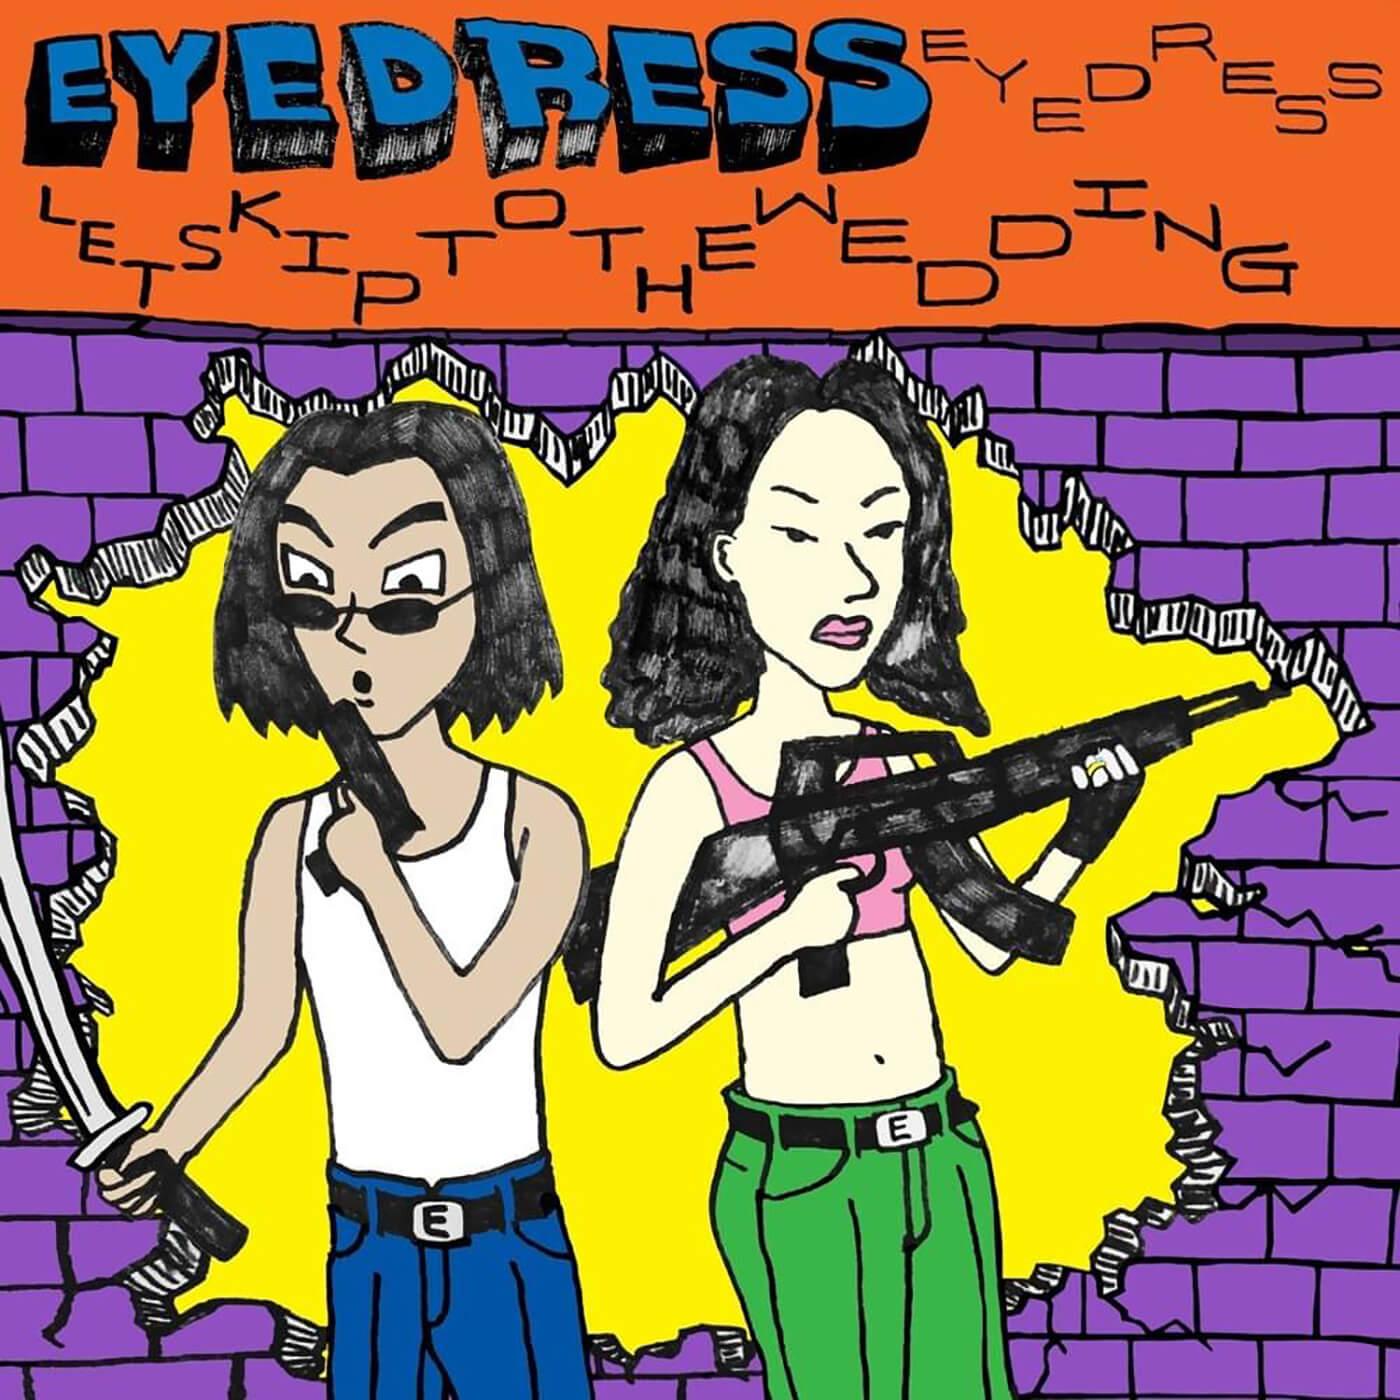 Eyedress - Let's Skip To The Wedding